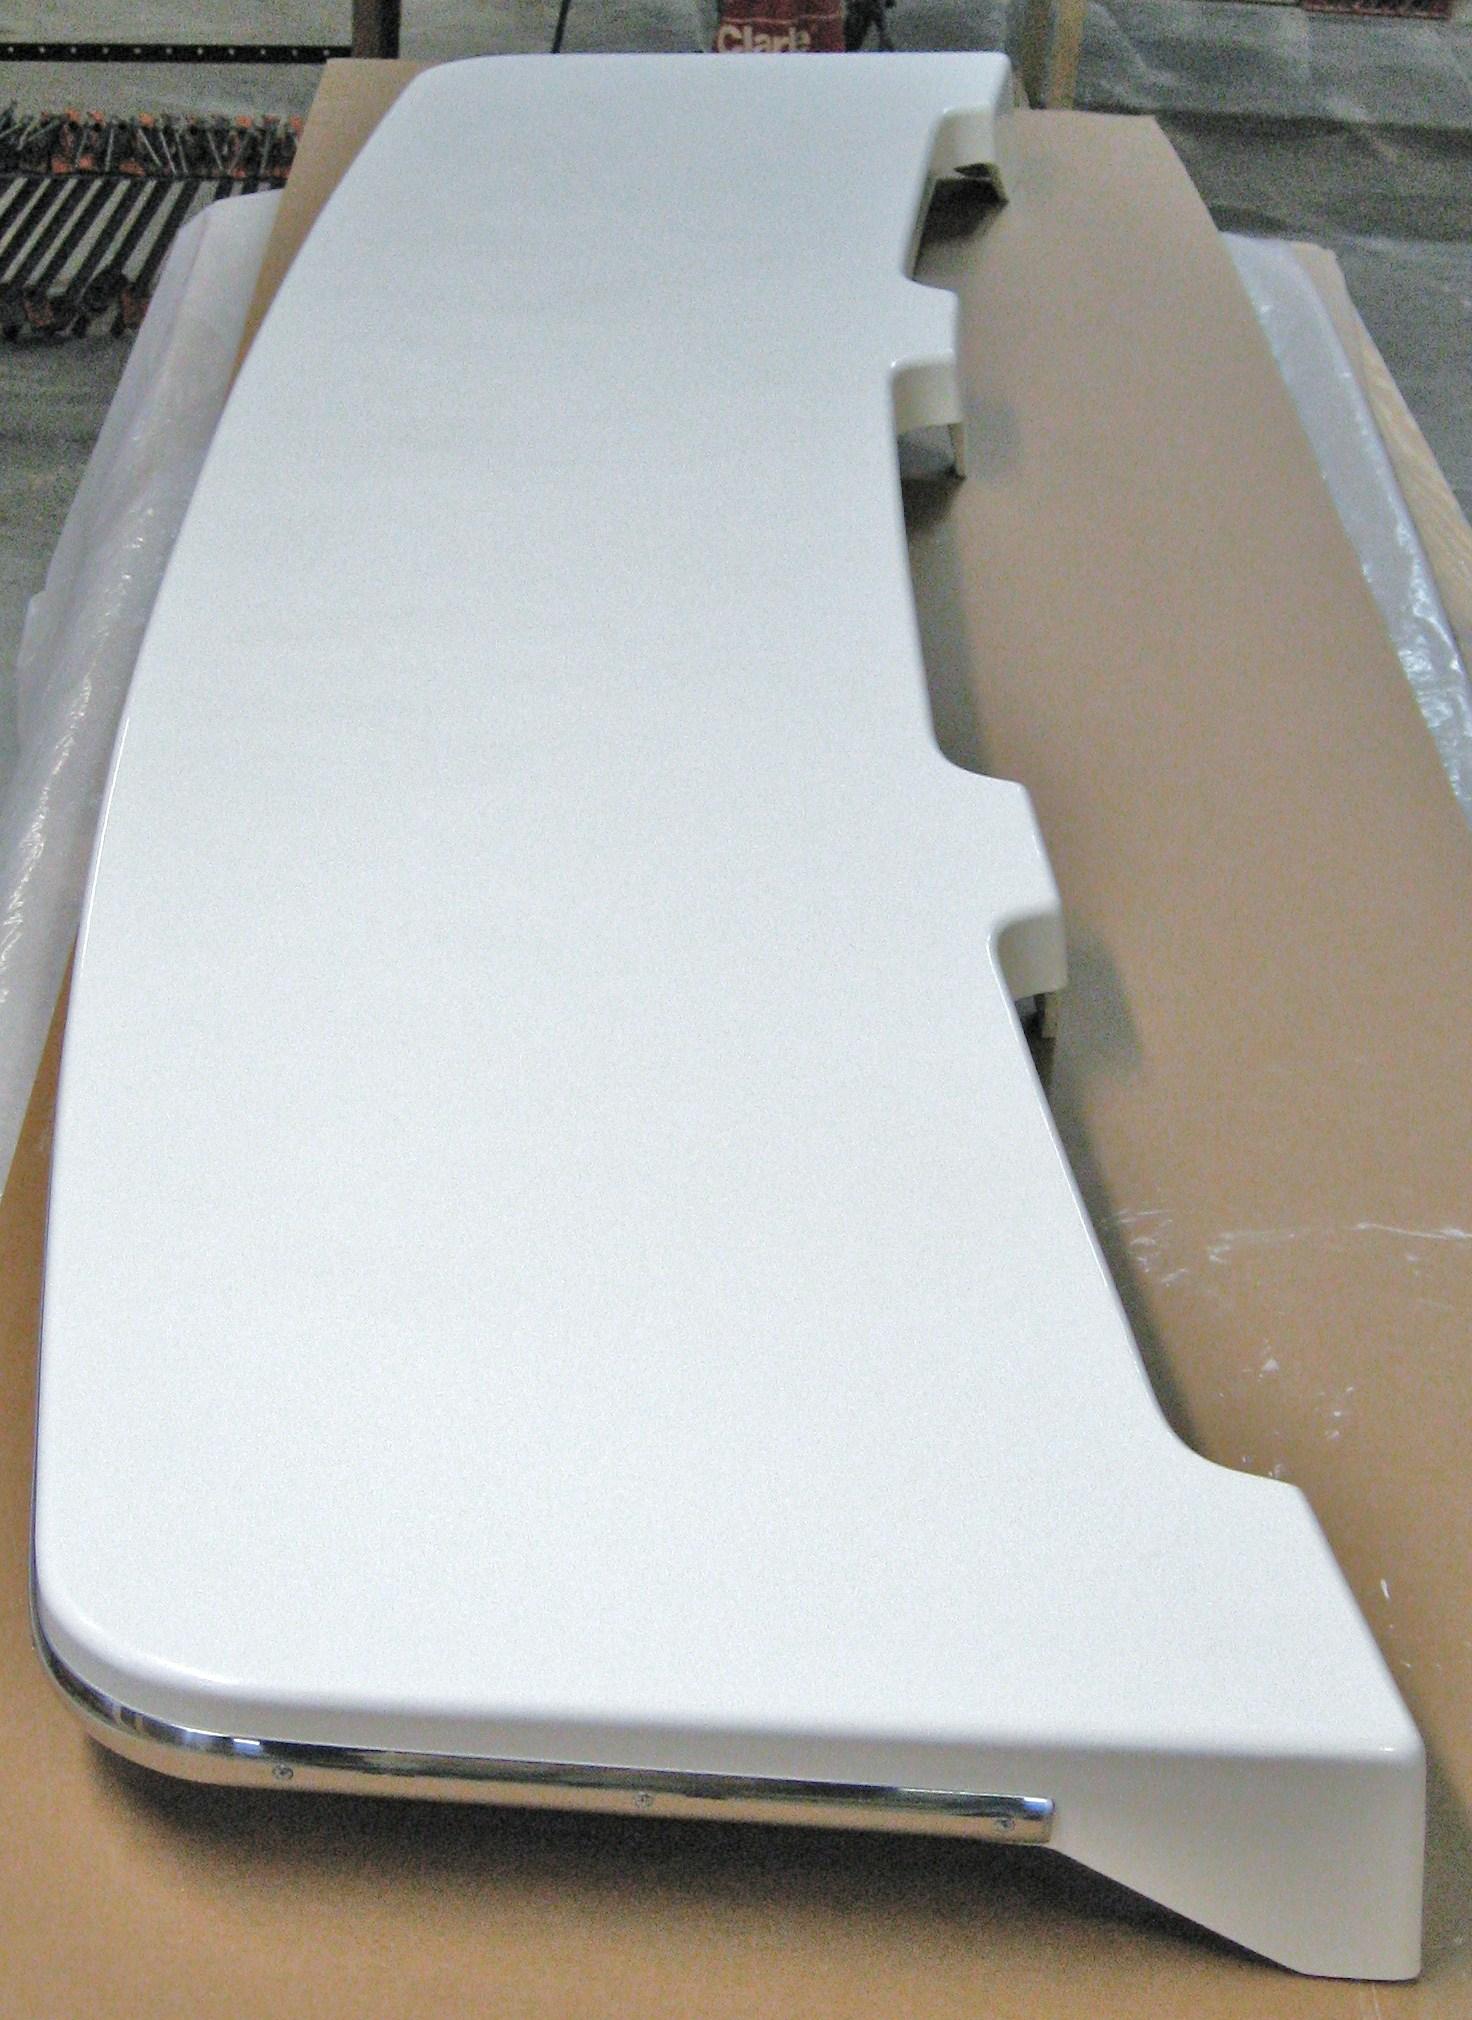 fiberglass-transom-platform-custom